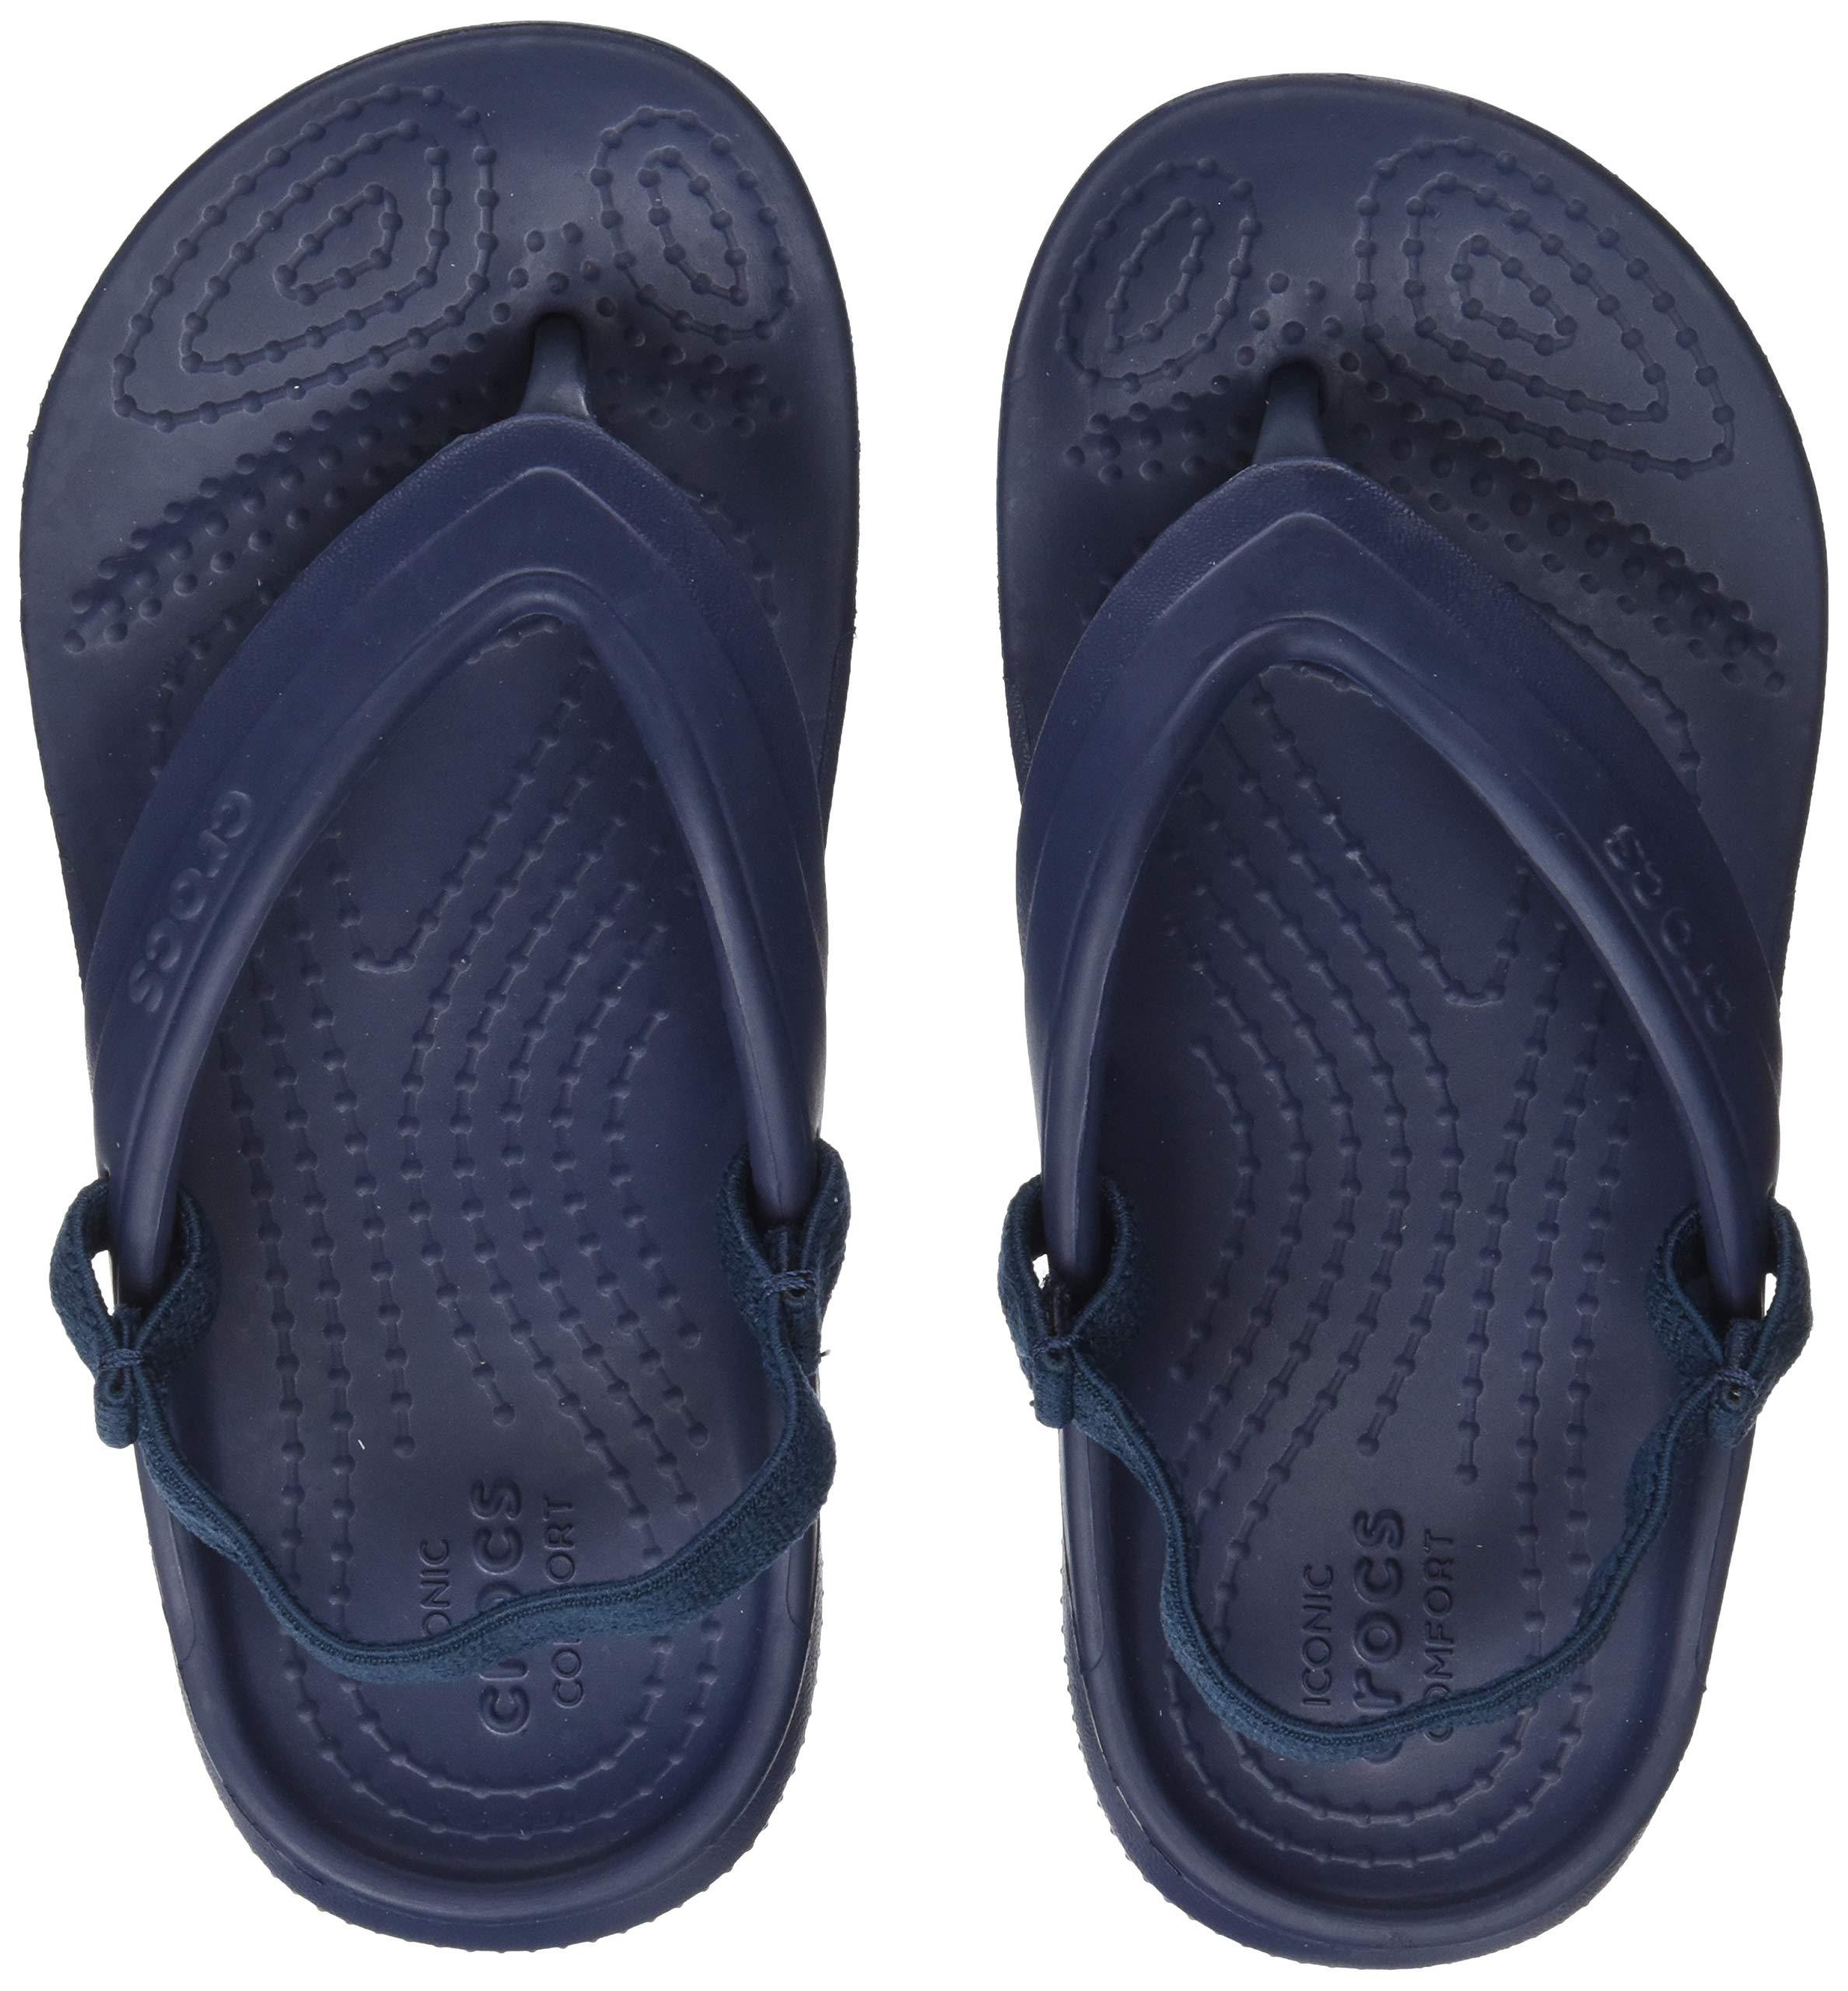 Crocs Classic K Flip Flop (Toddler/Little Kid), Navy, 9 M US Toddler